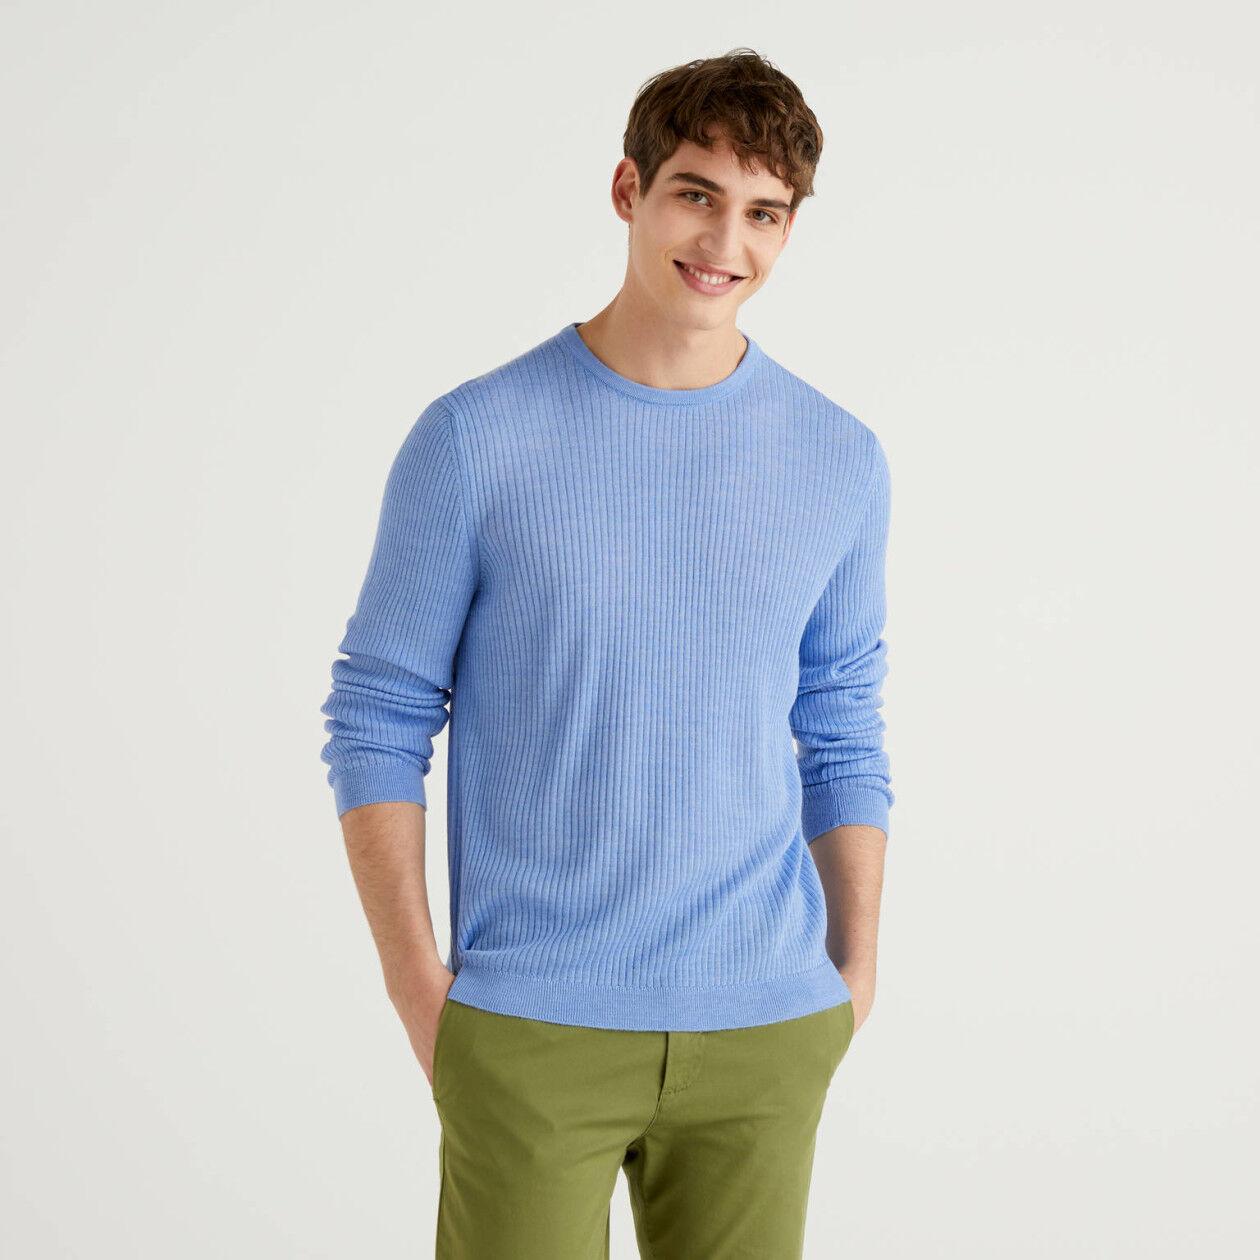 Pullover im Rippenmuster mit Rundausschnitt